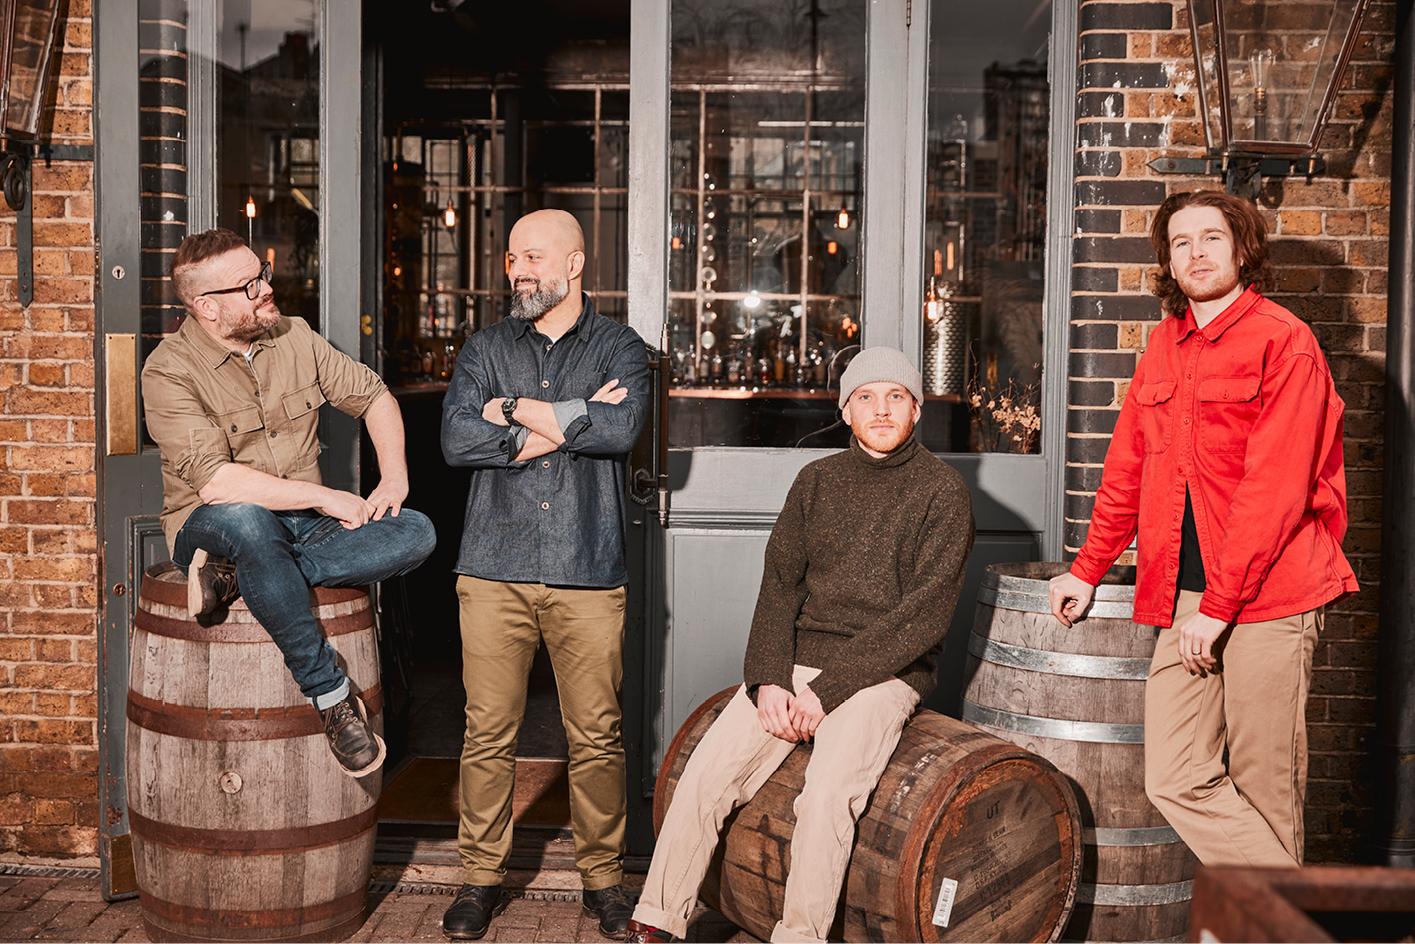 The founders of East London Liquor Company